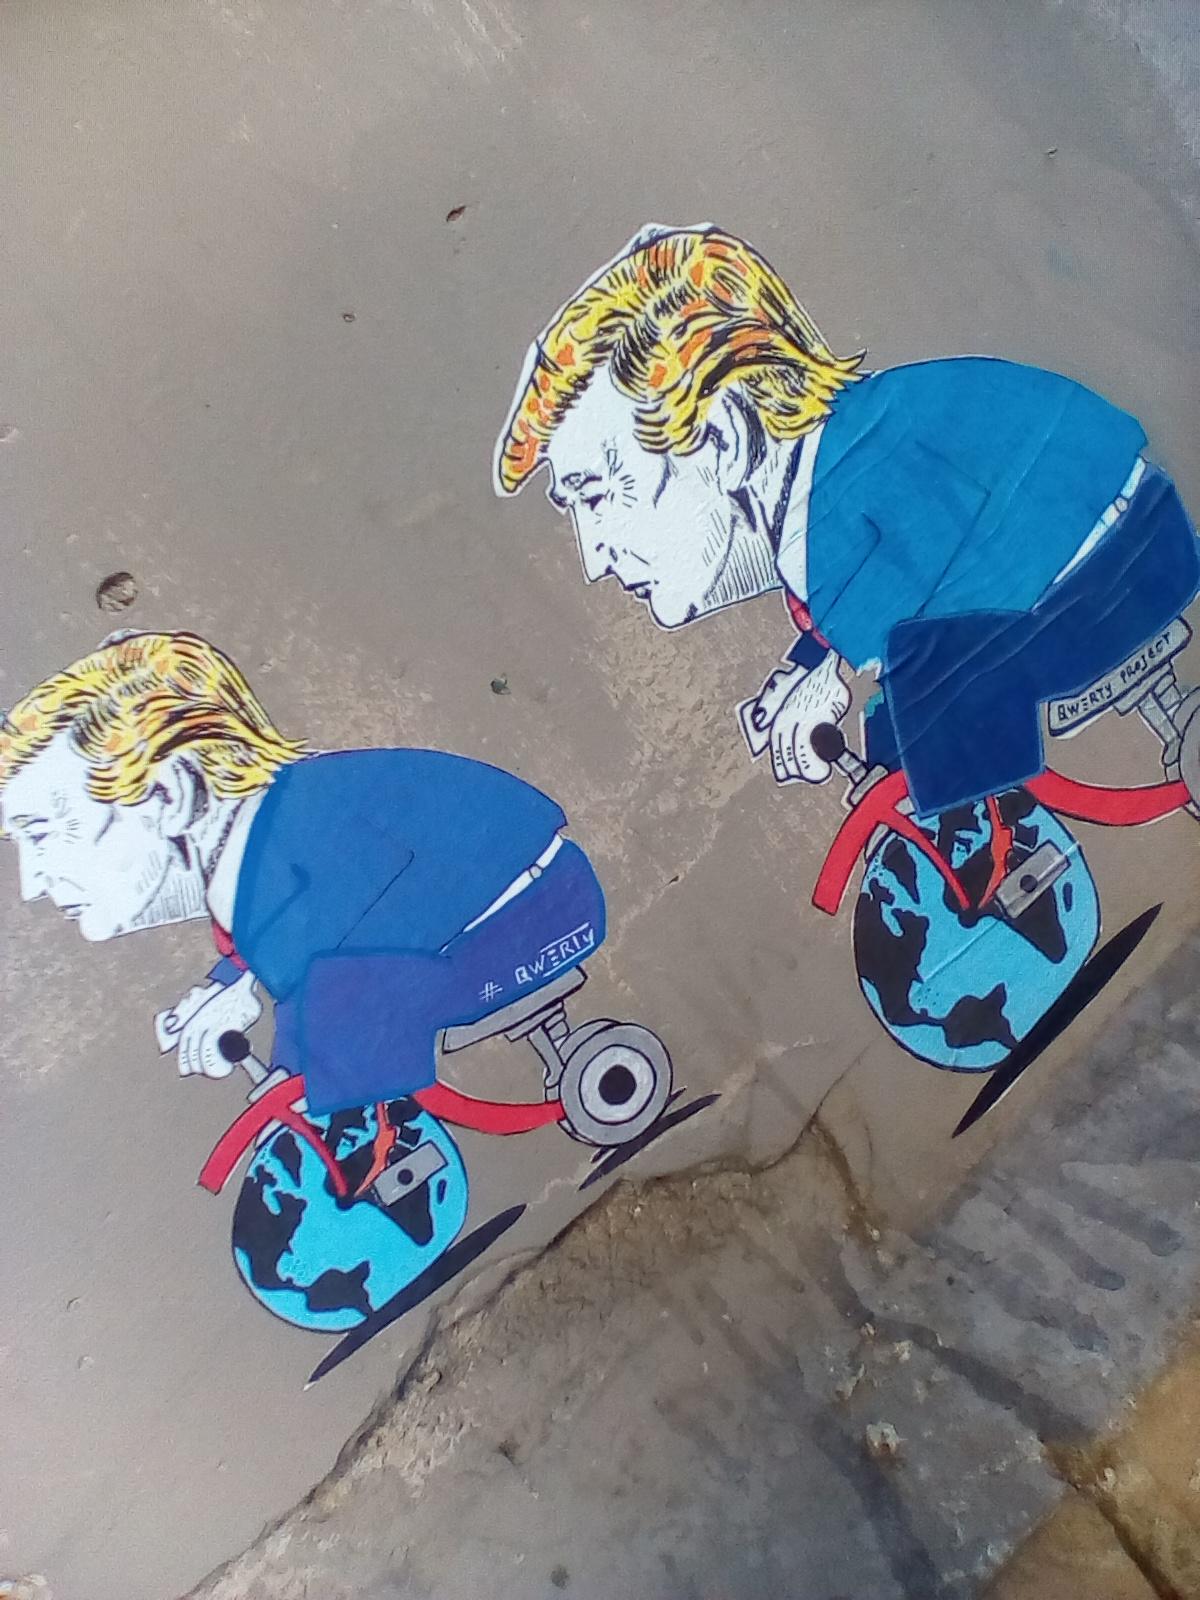 Rome grafity (0i άνθρωποι είναι φτιαγμένοι για να βασανίζει ο ένας τον άλλο